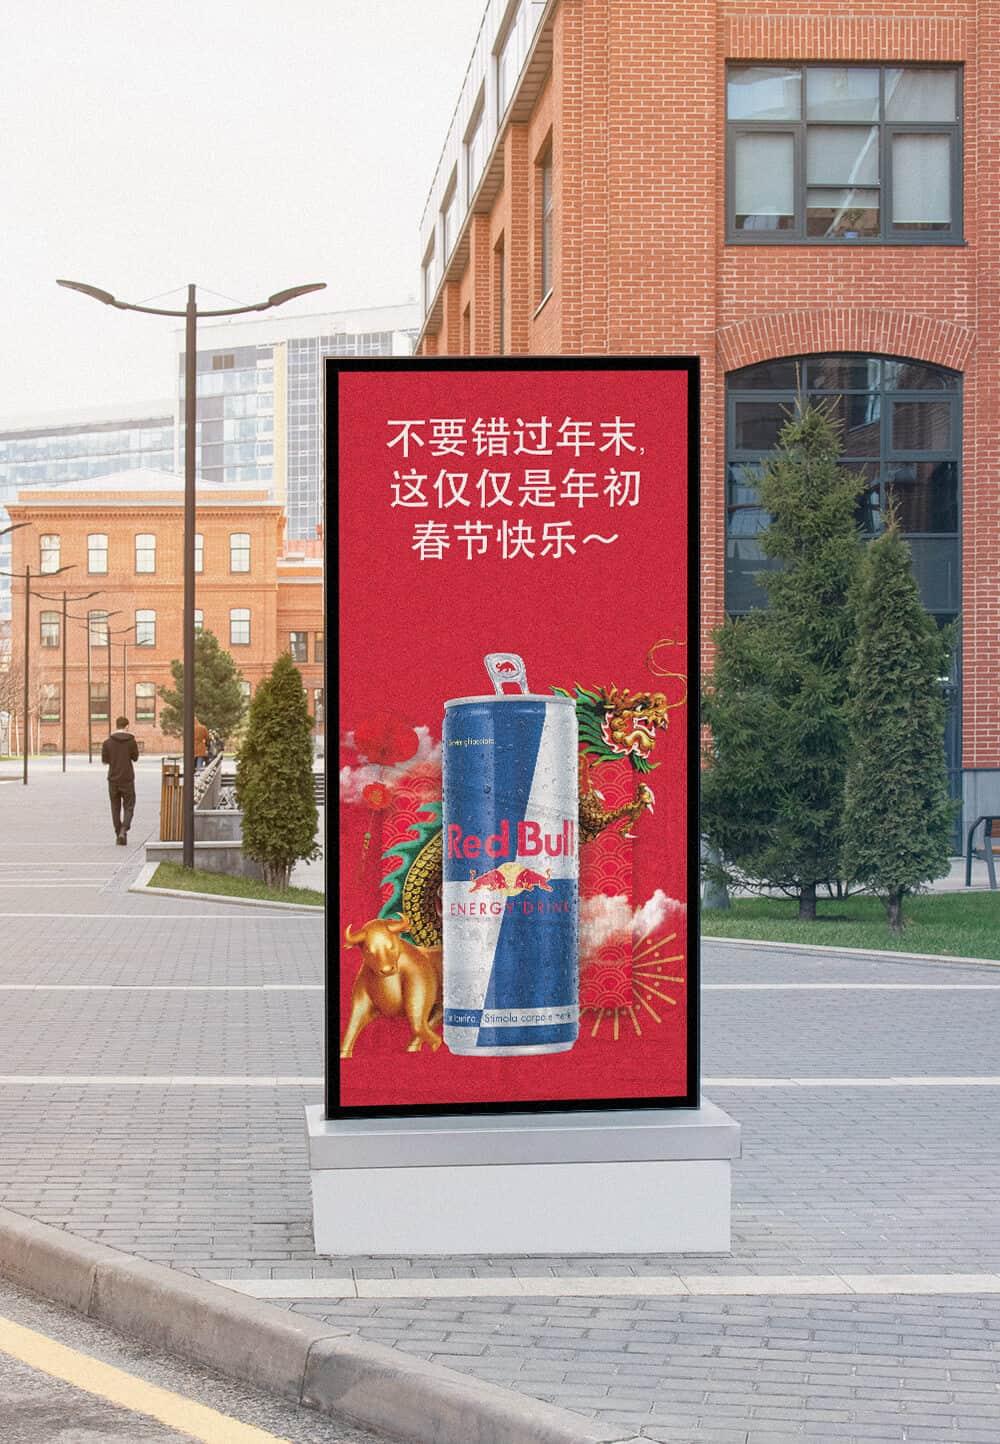 Red Bull - Capodanno Cinese - Totem